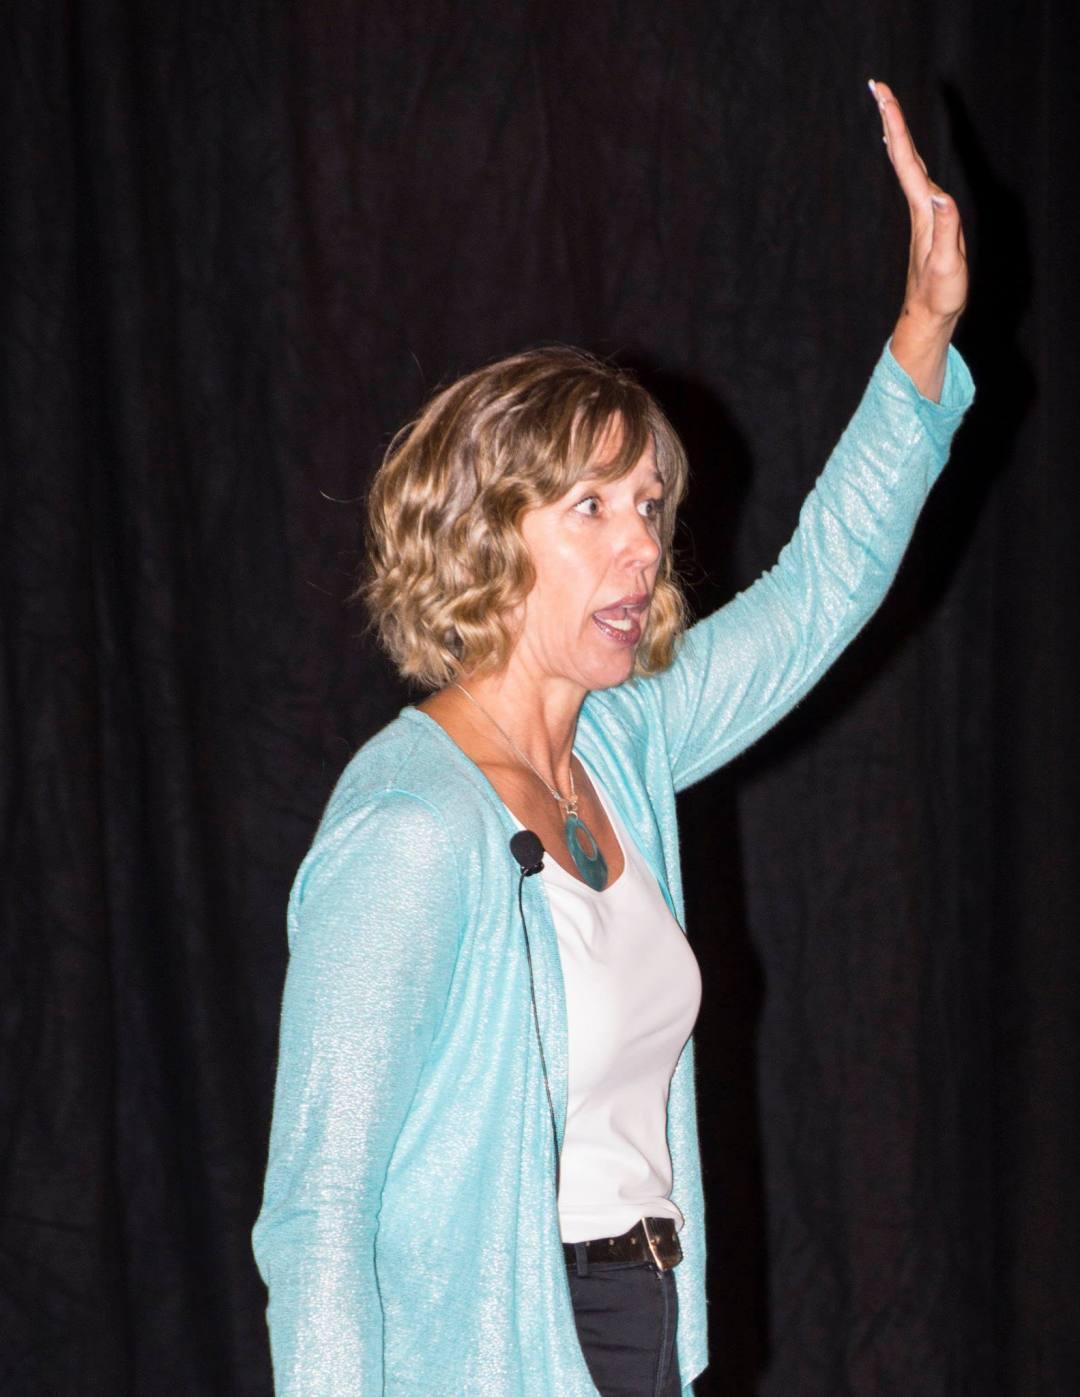 Speaking at AMLive